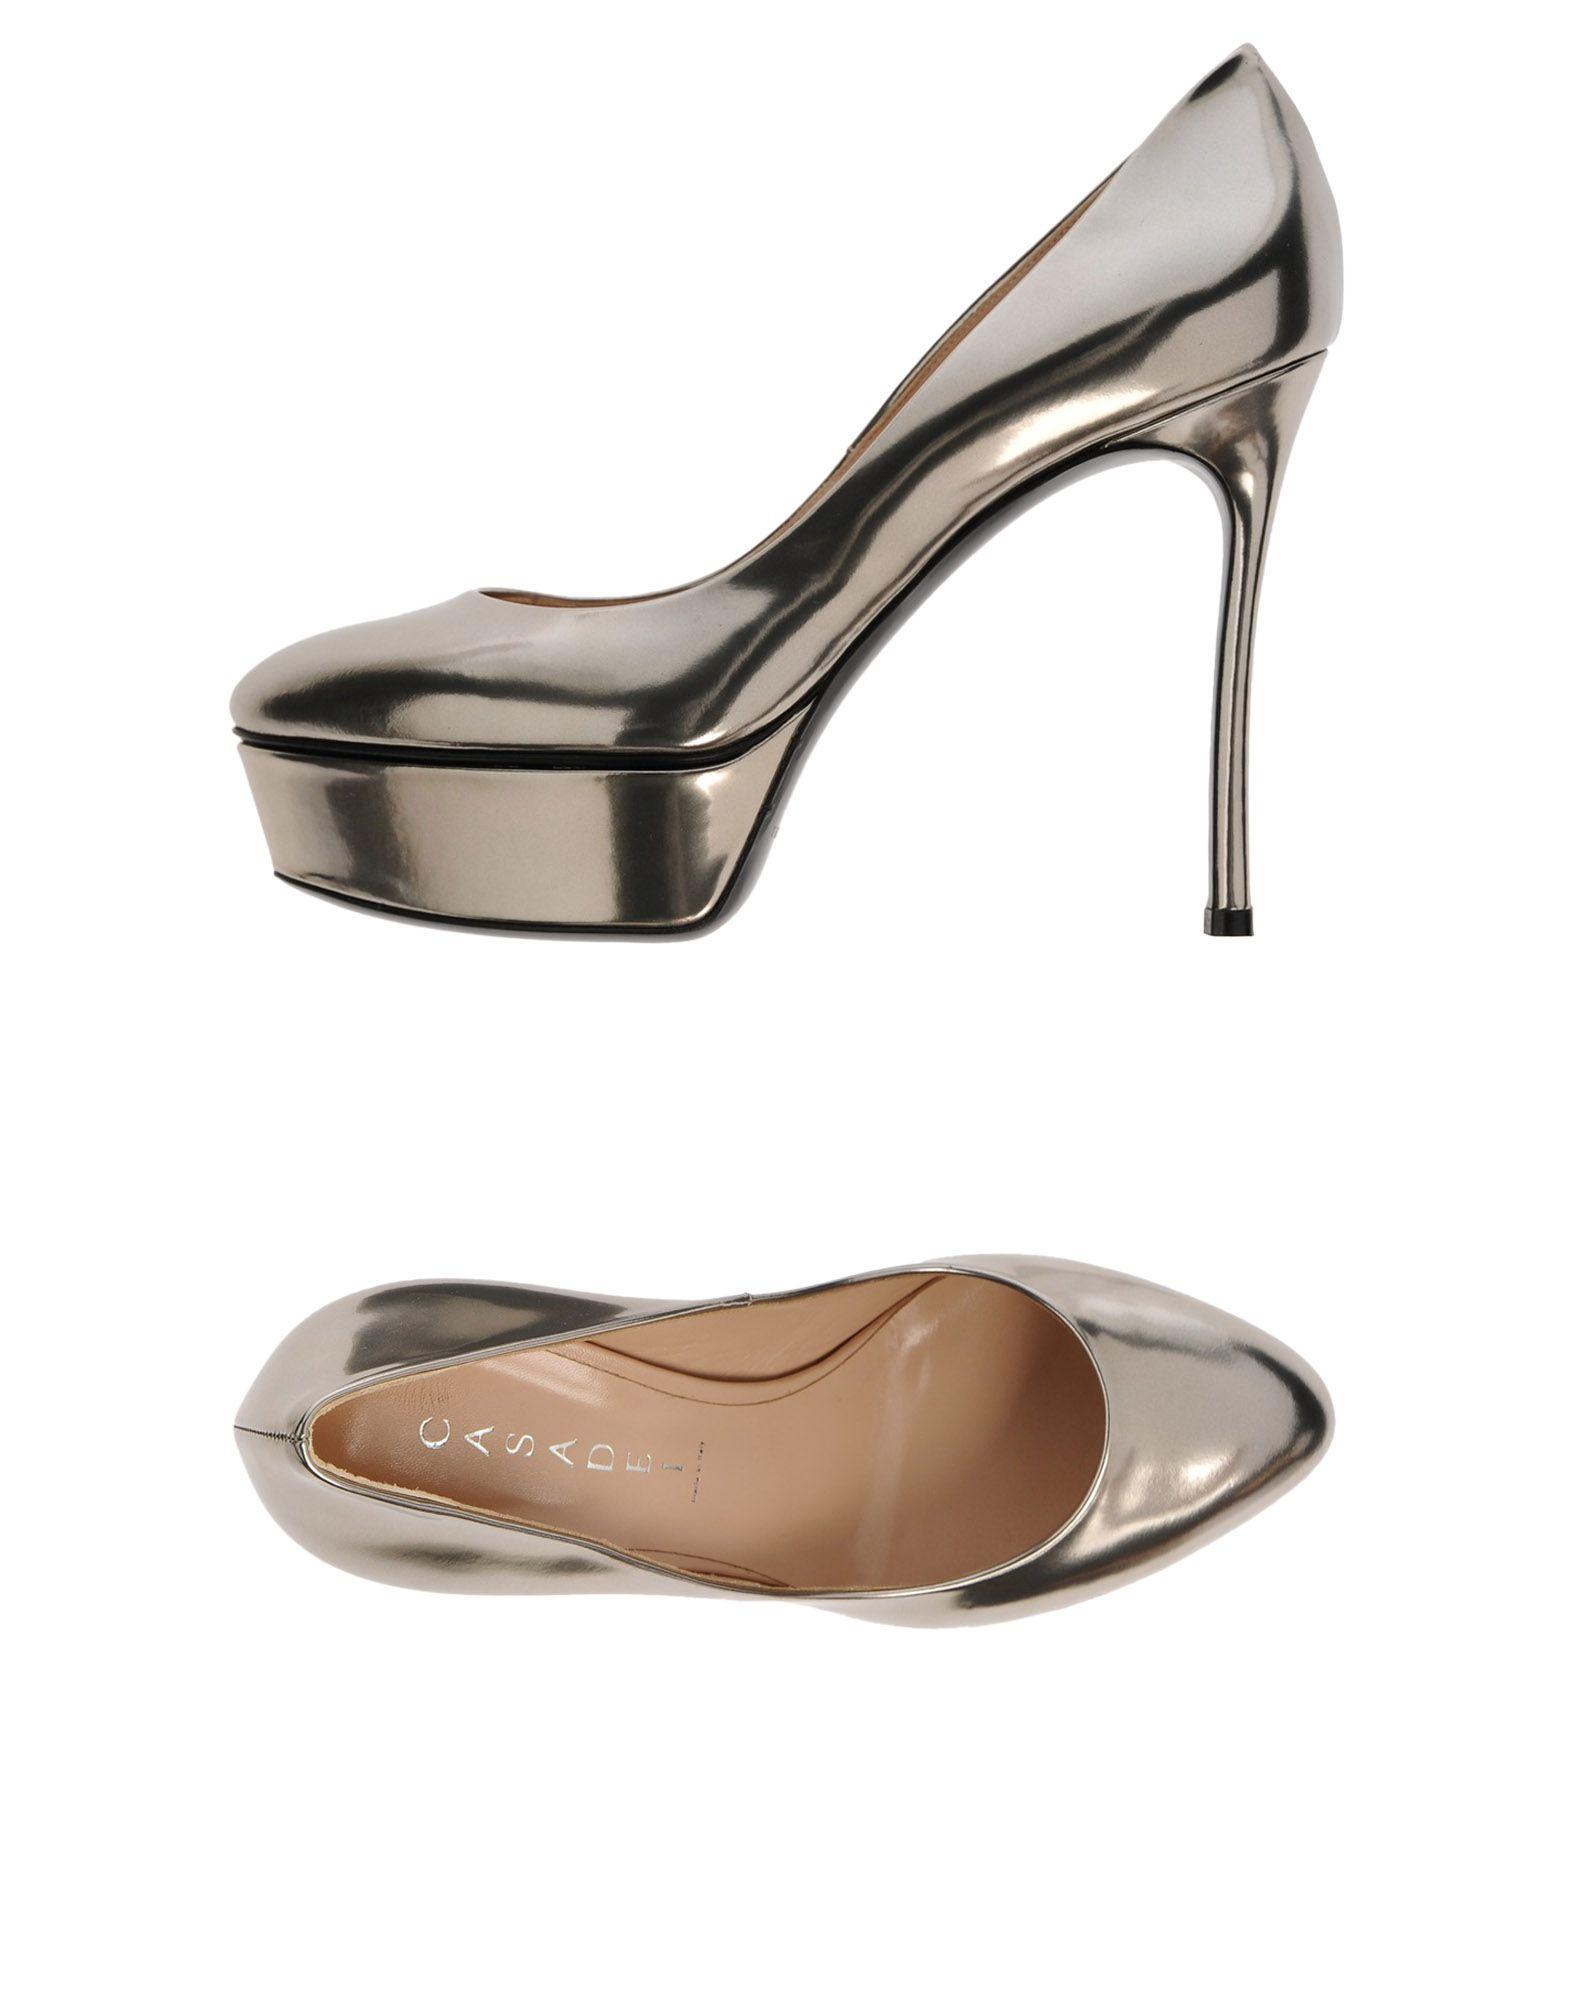 Rabatt Rabatt Rabatt Schuhe Casadei Pumps Damen  11503551JW 14d9ed